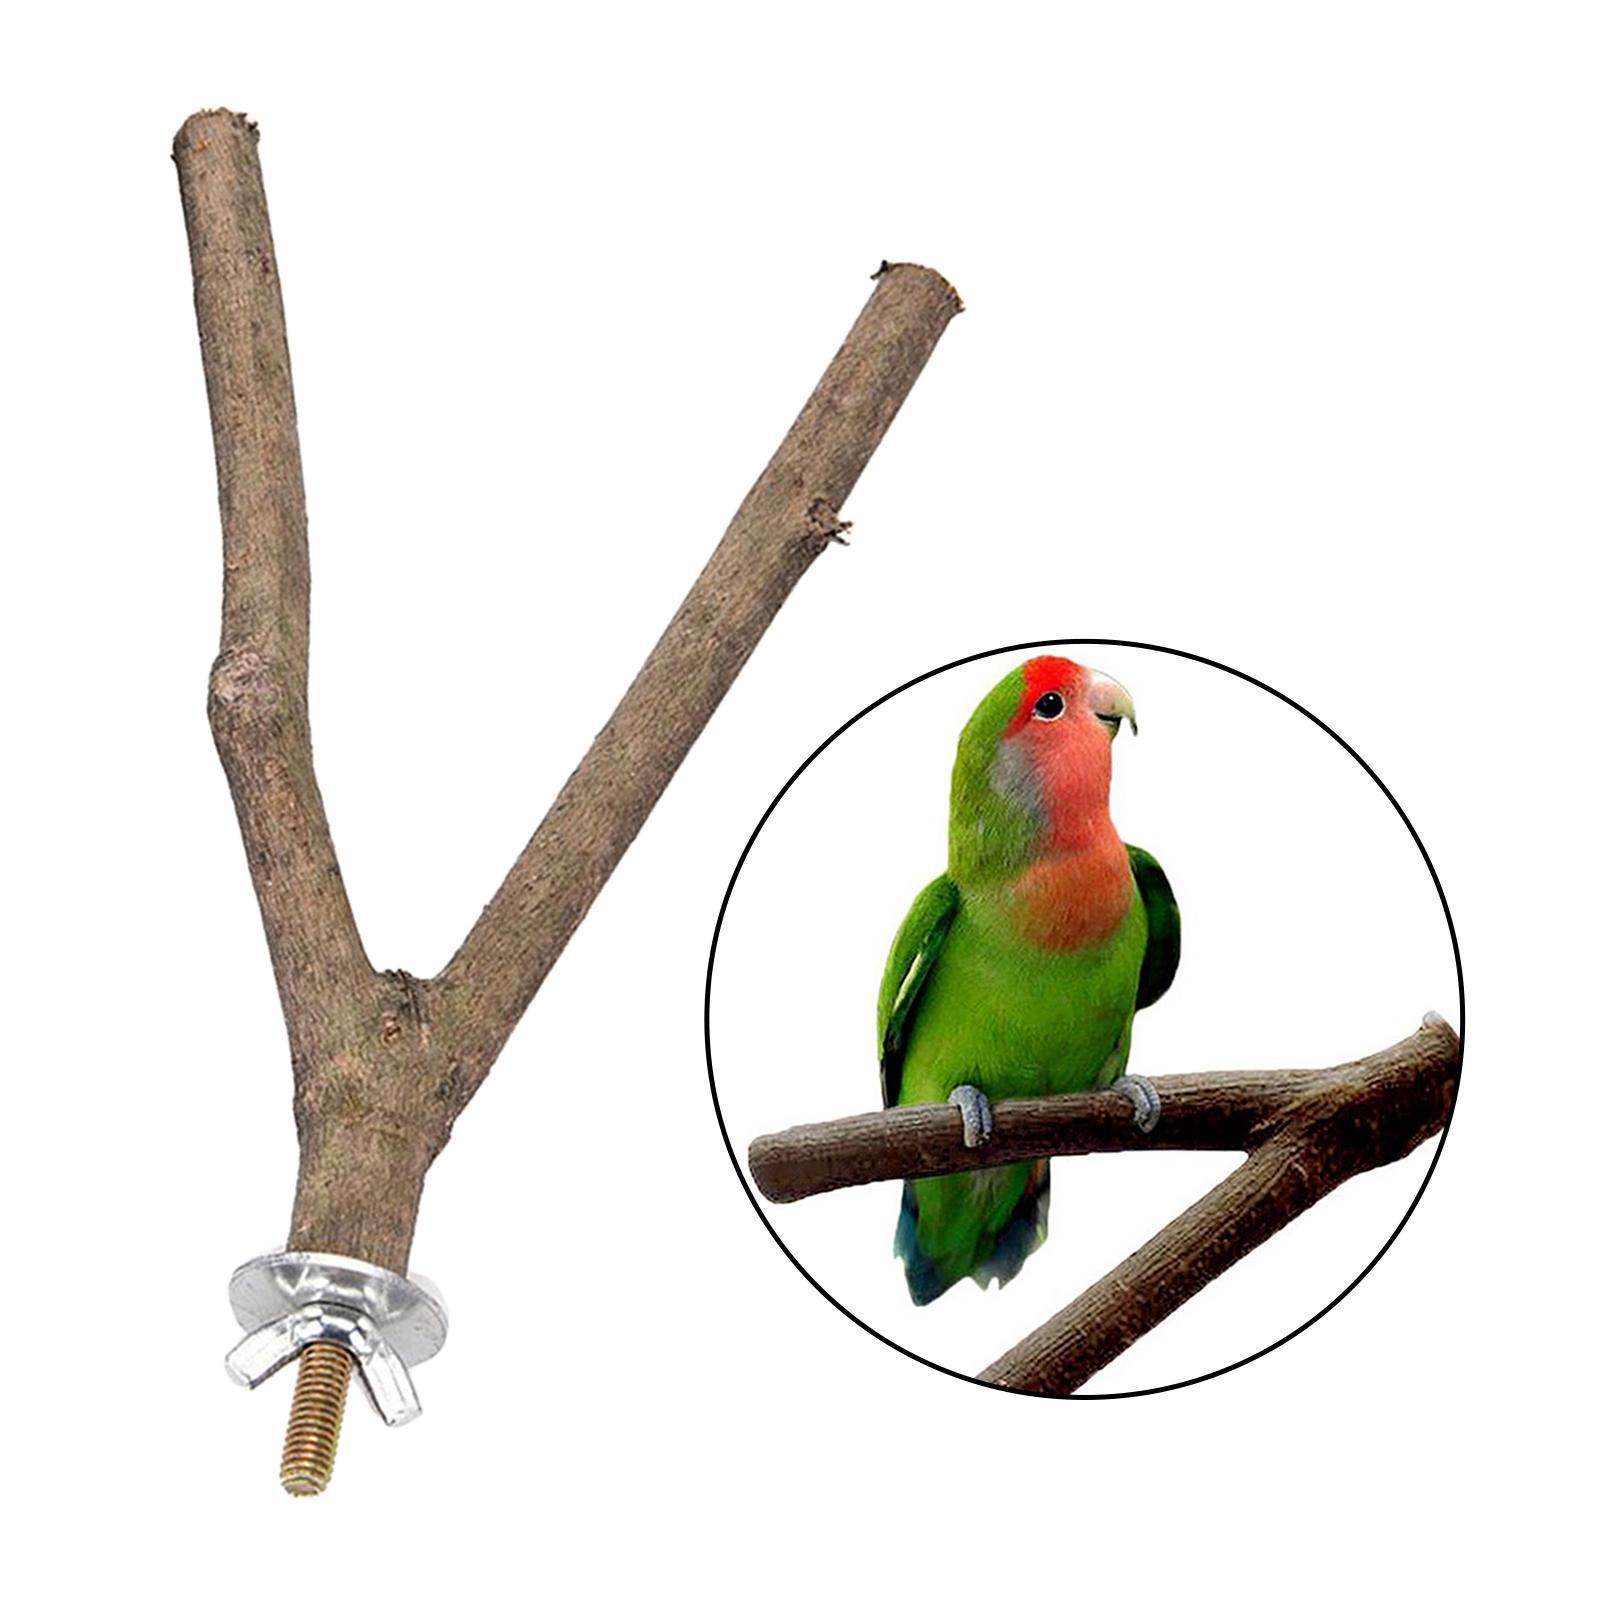 thumbnail 41 - Bird-Perch-Wood-Stand-Bird-Cage-Swing-Branch-for-Parrot-Parakeet-Cockatiel